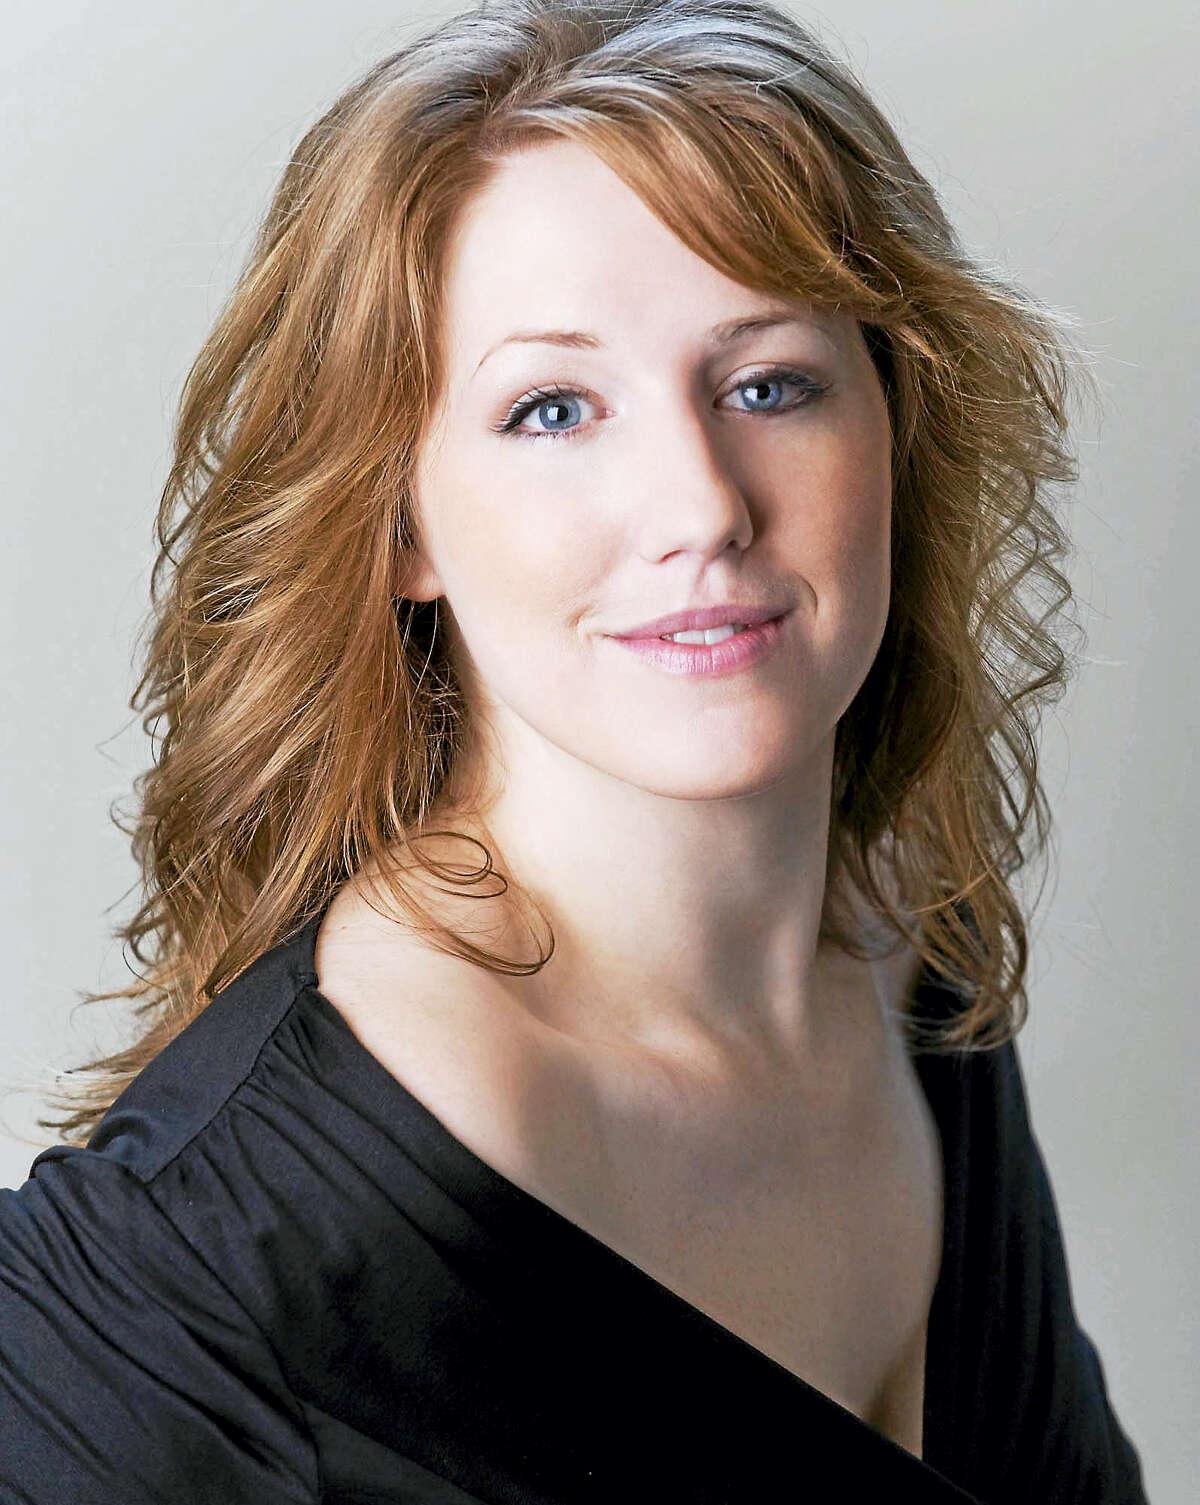 Soprano Amanda Hall